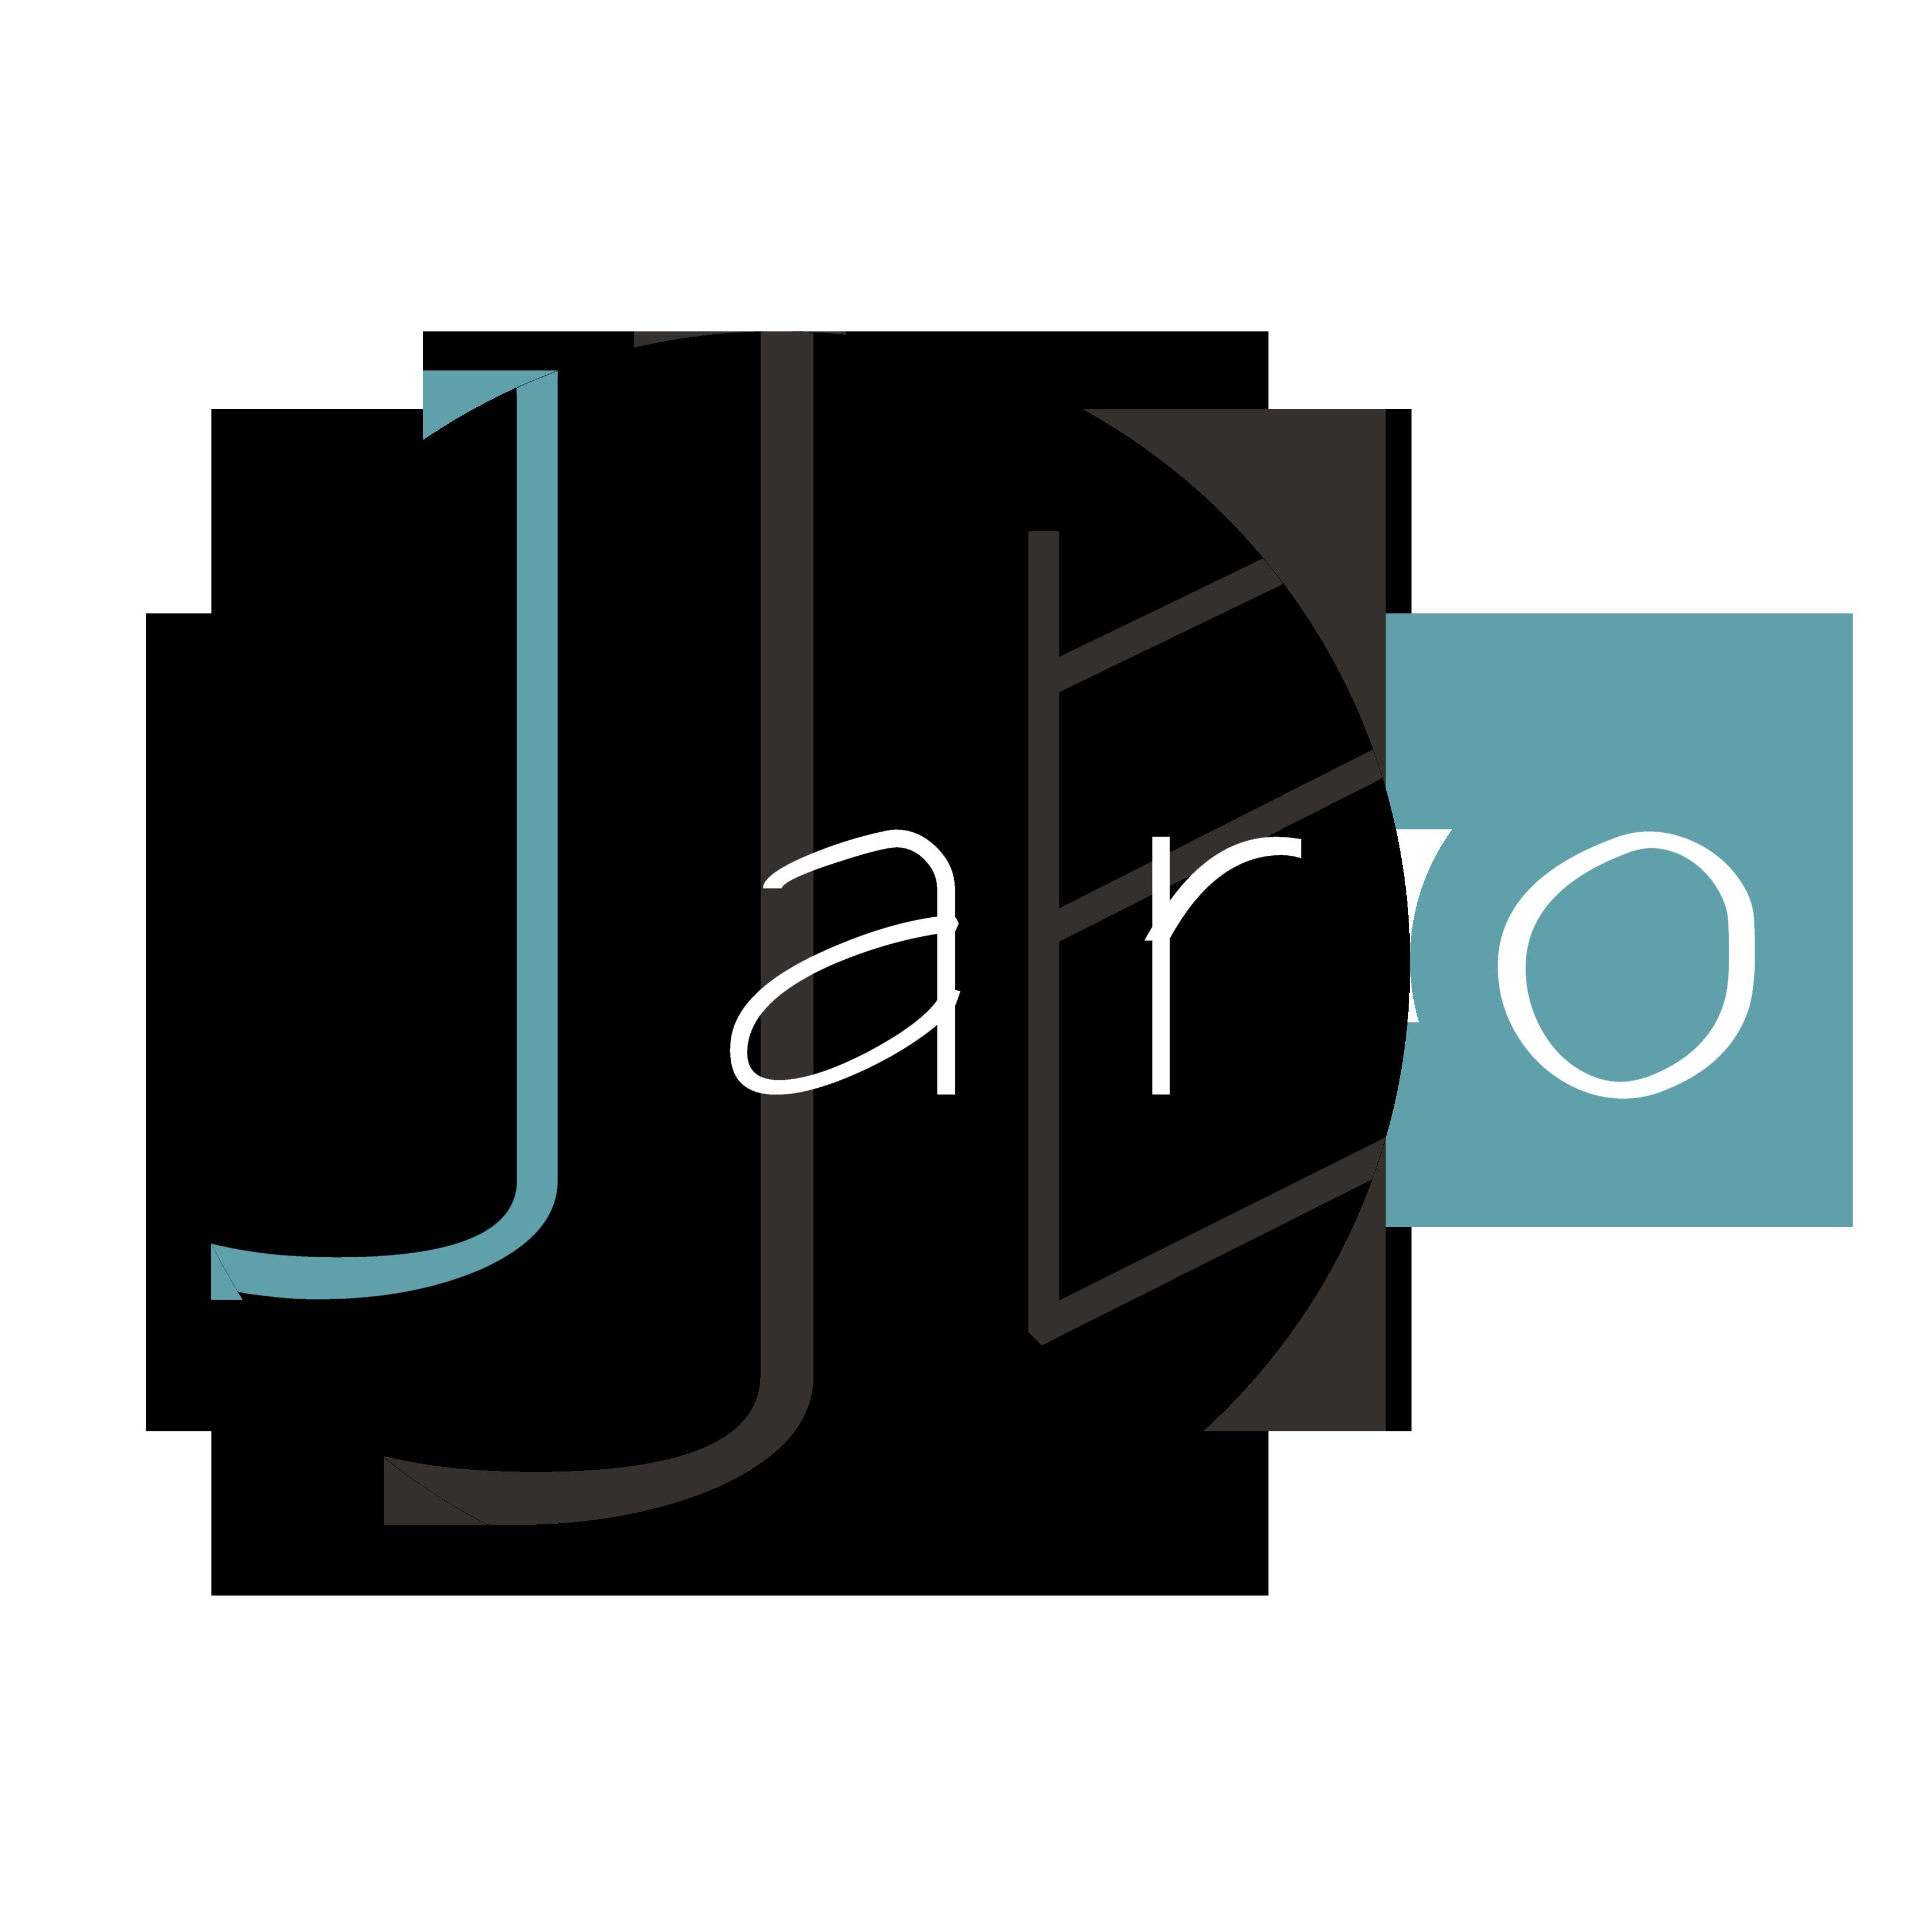 Jaro Joyería Experimental